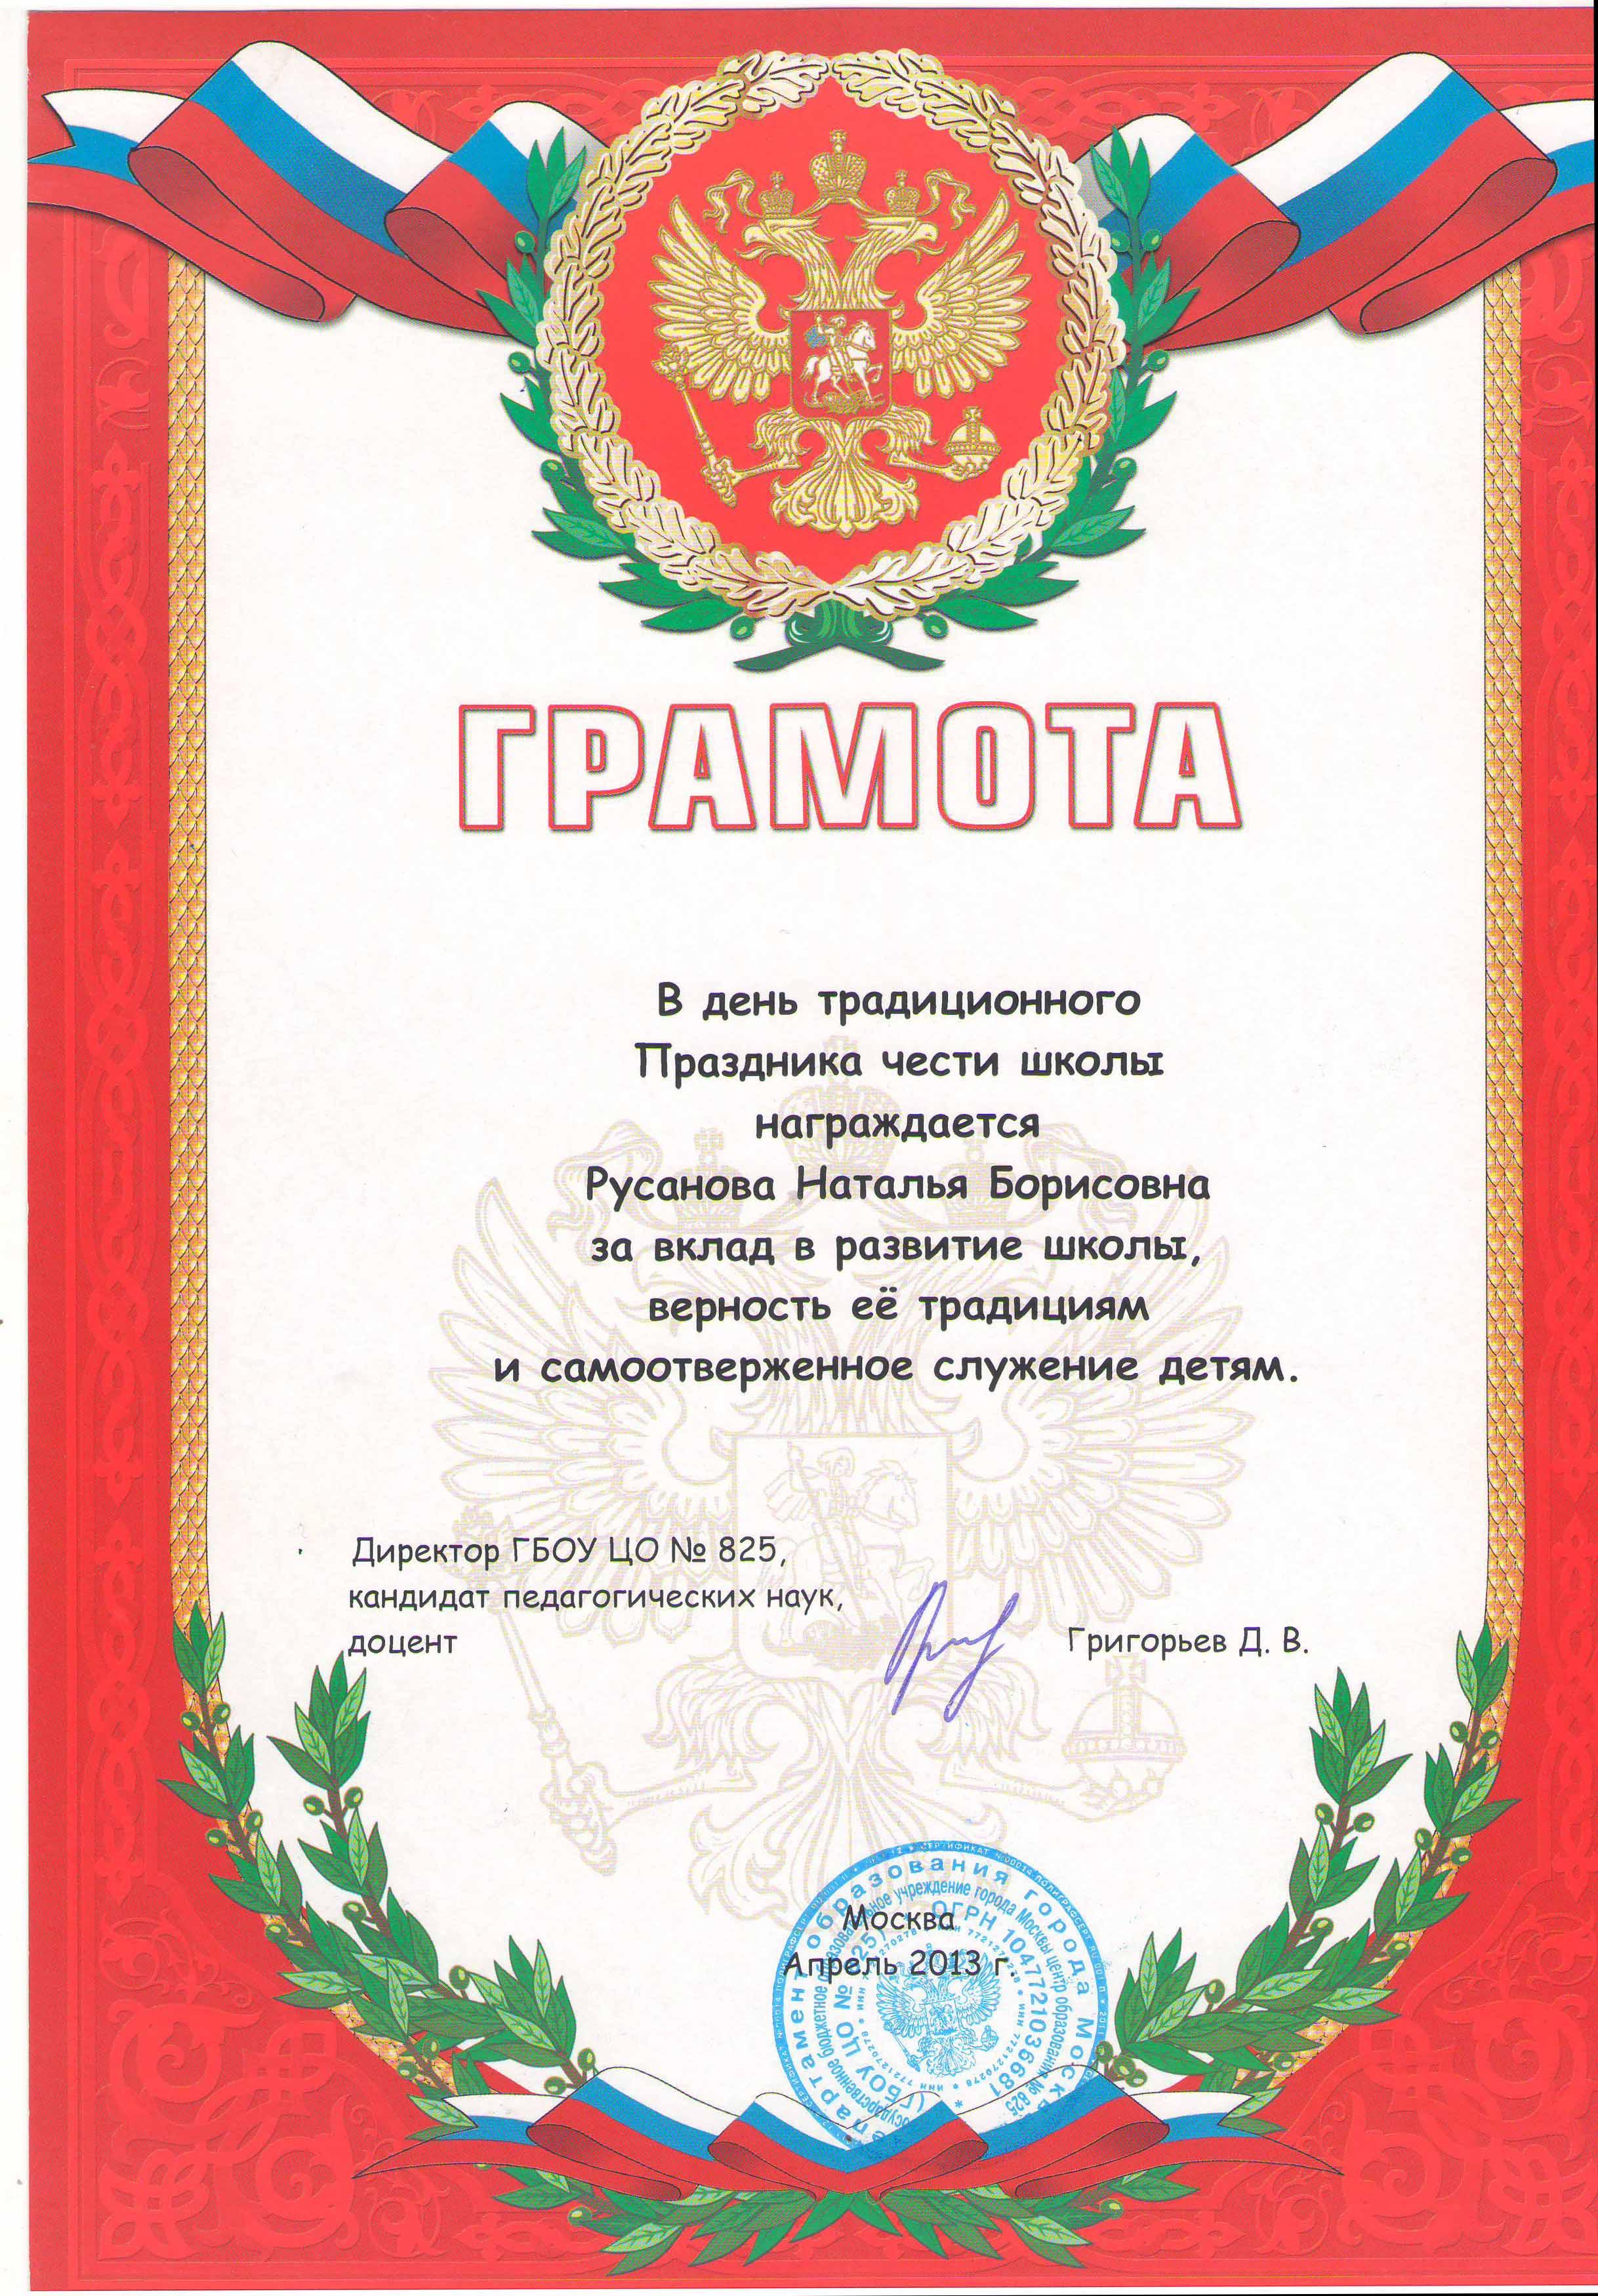 gramota-2013